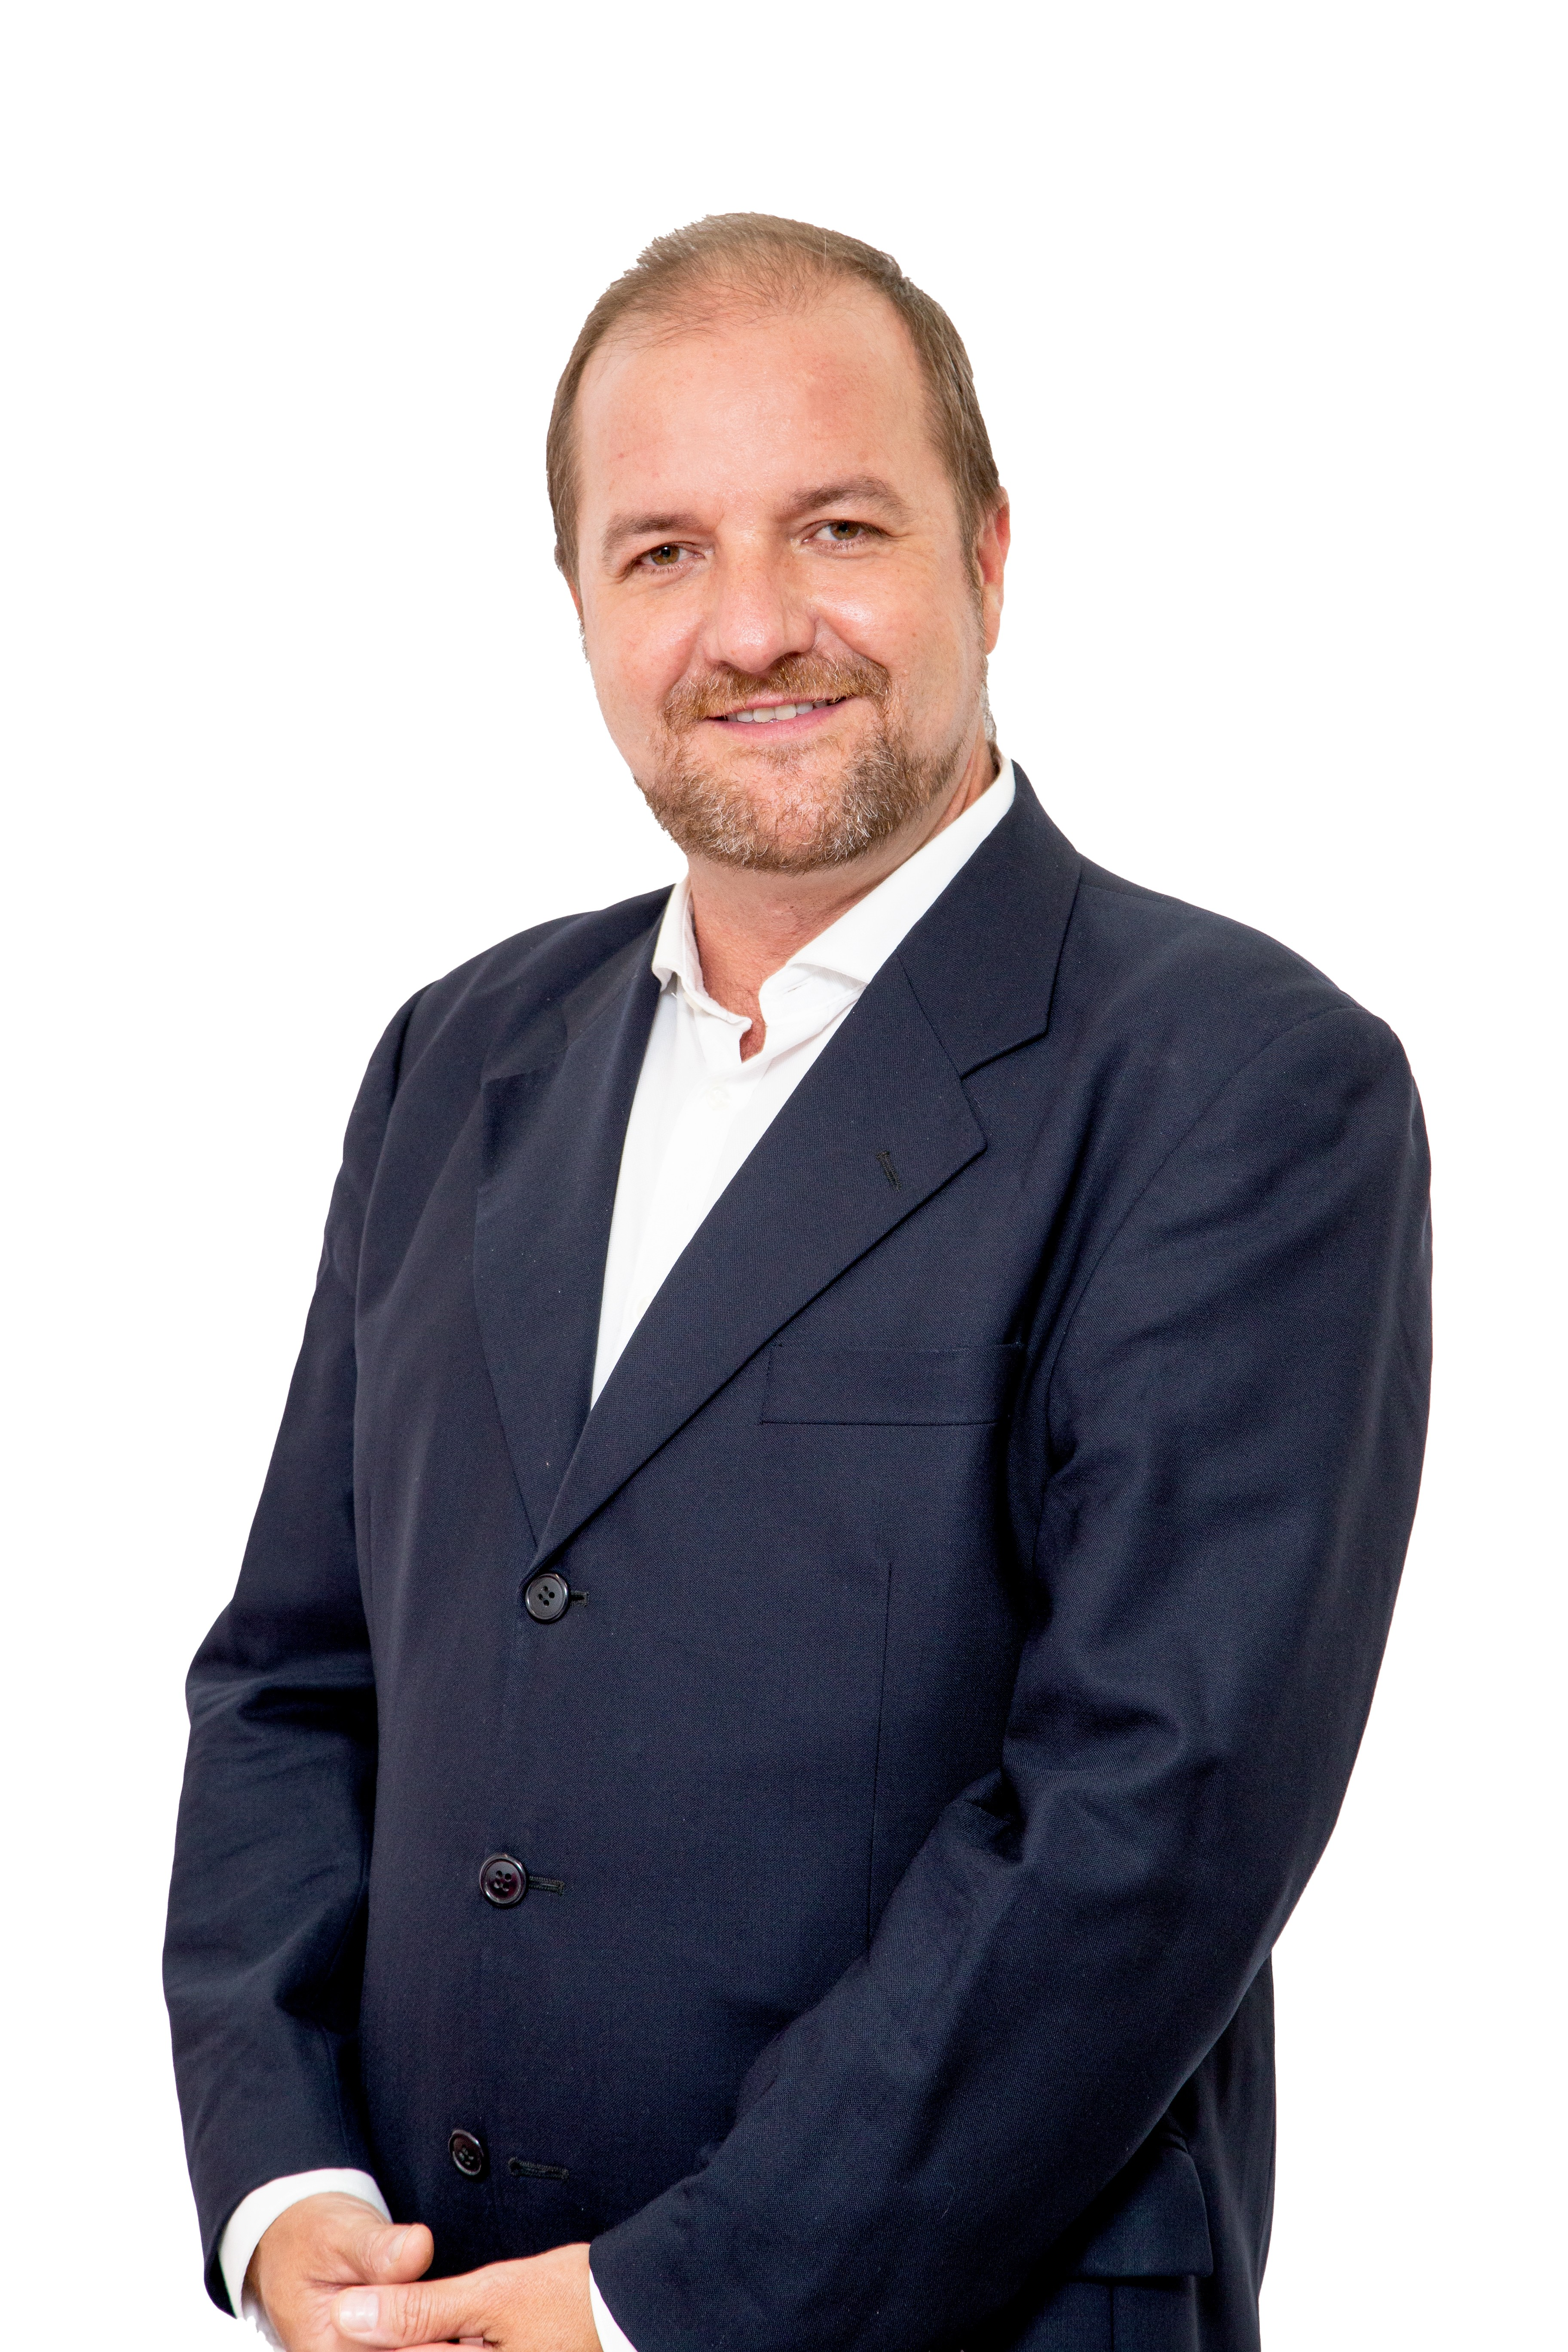 Bernardo Riaza